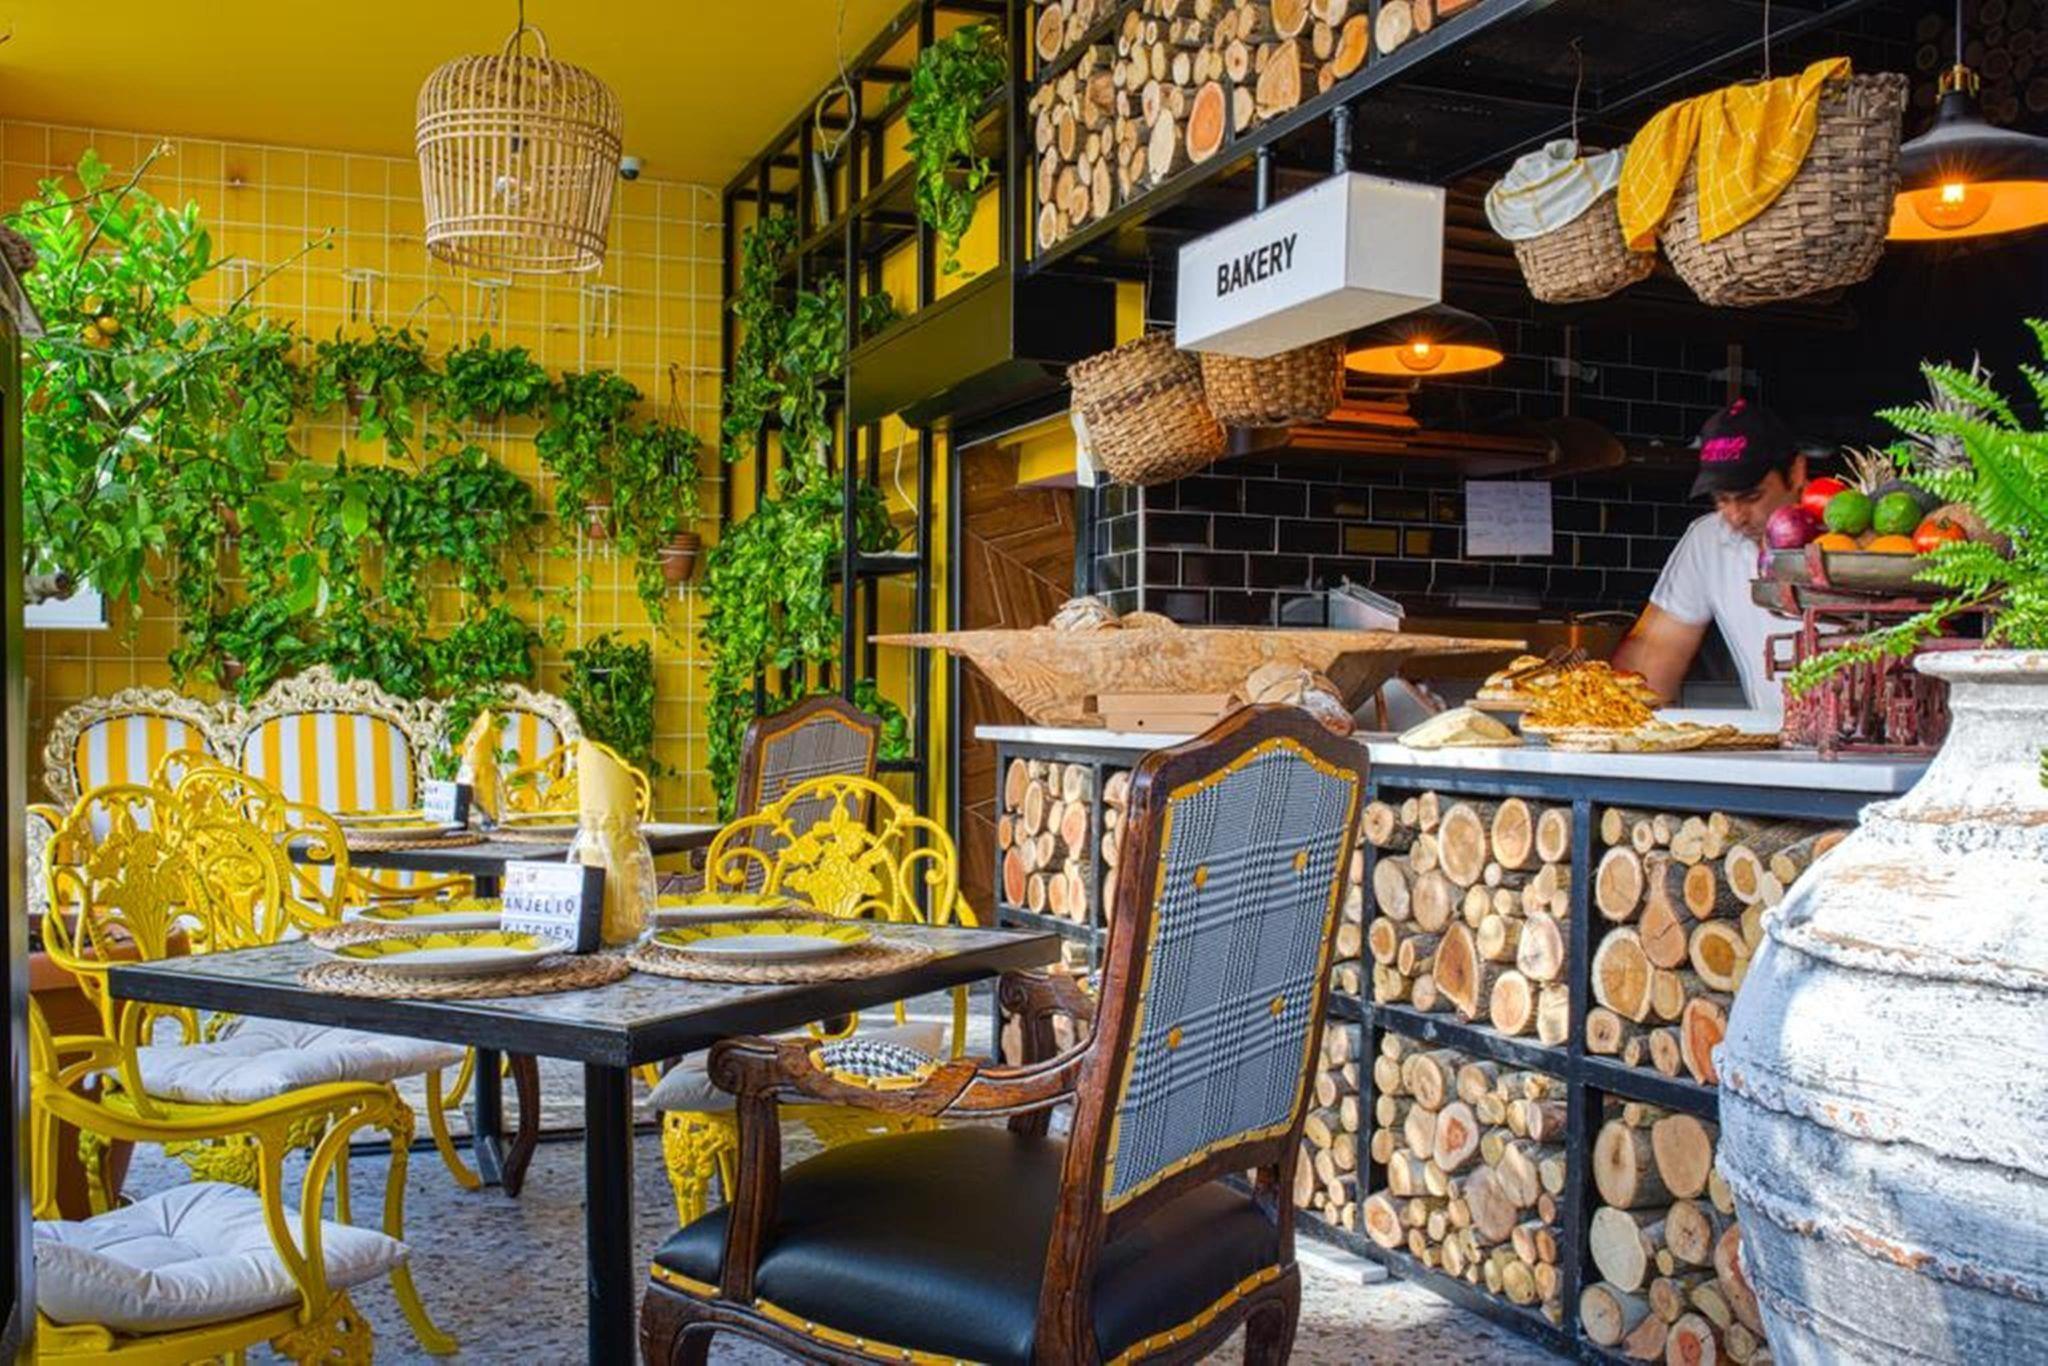 http://www.orextravel.sk/OREX/hotelphotos/anjeliq-downtown-hotel-general-006.jpg